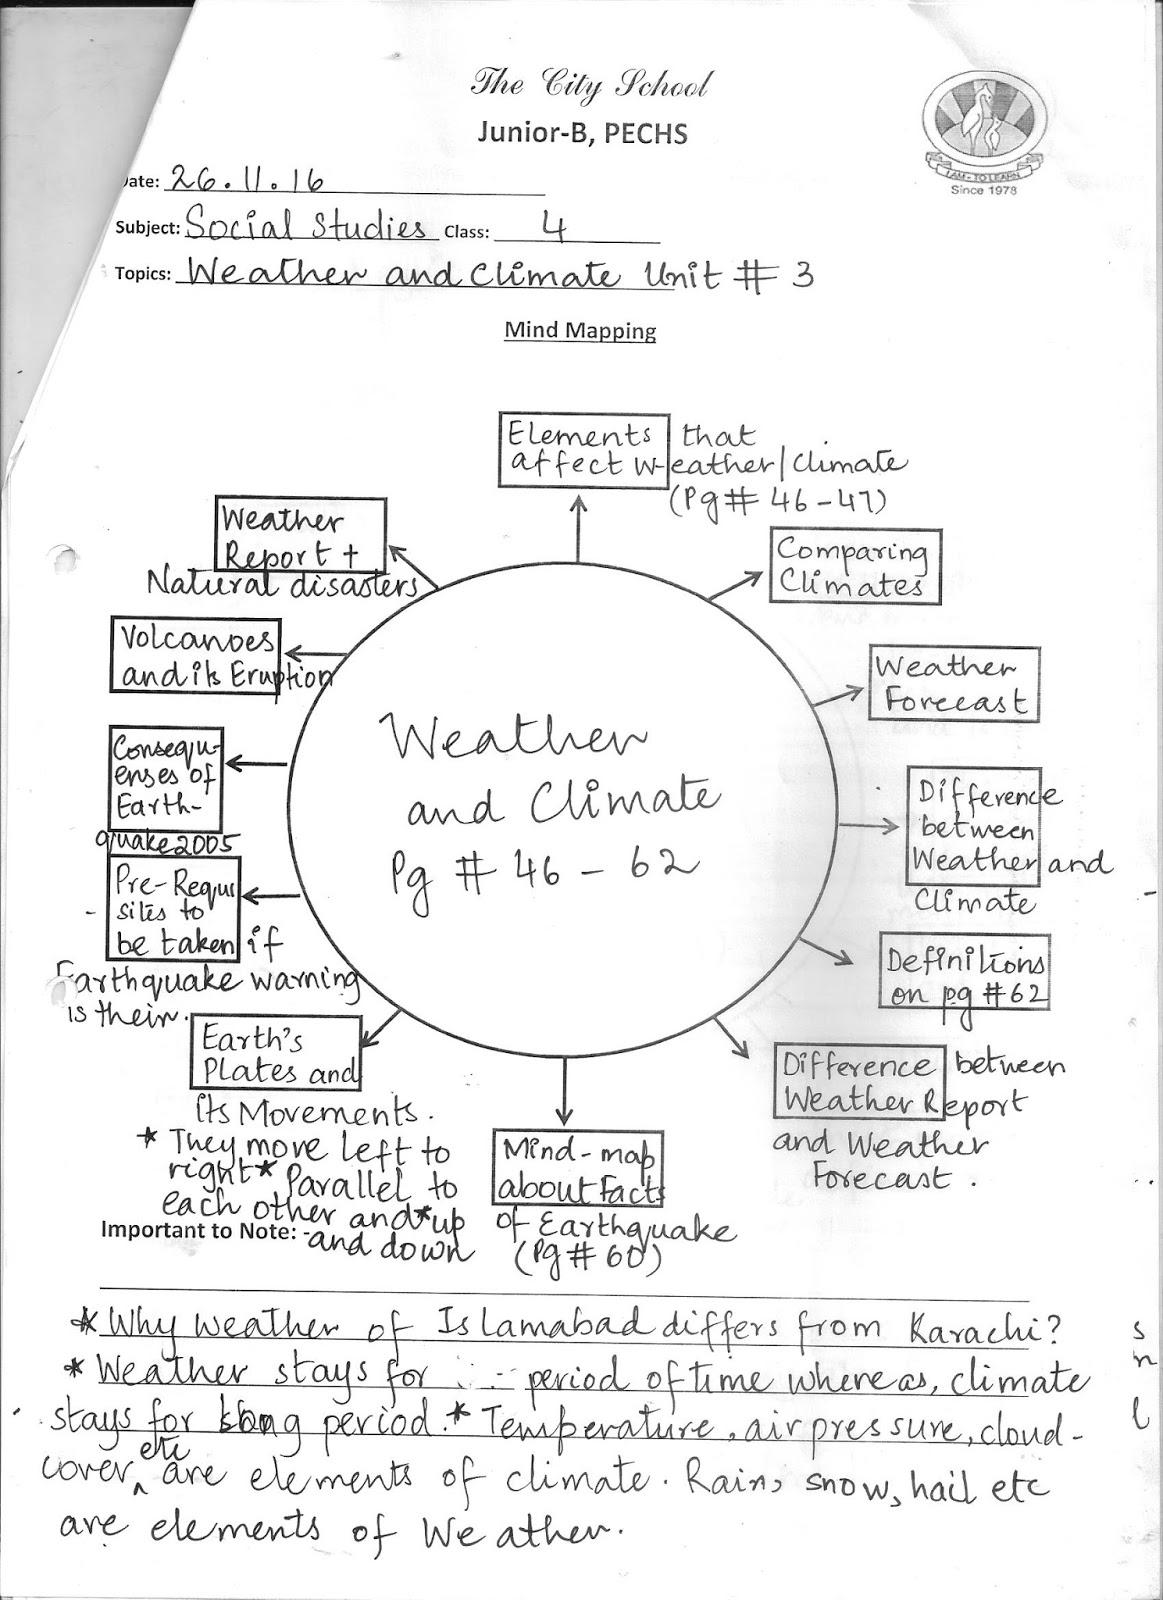 The City School Social Studies Grade 4 Reinforcement Worksheets